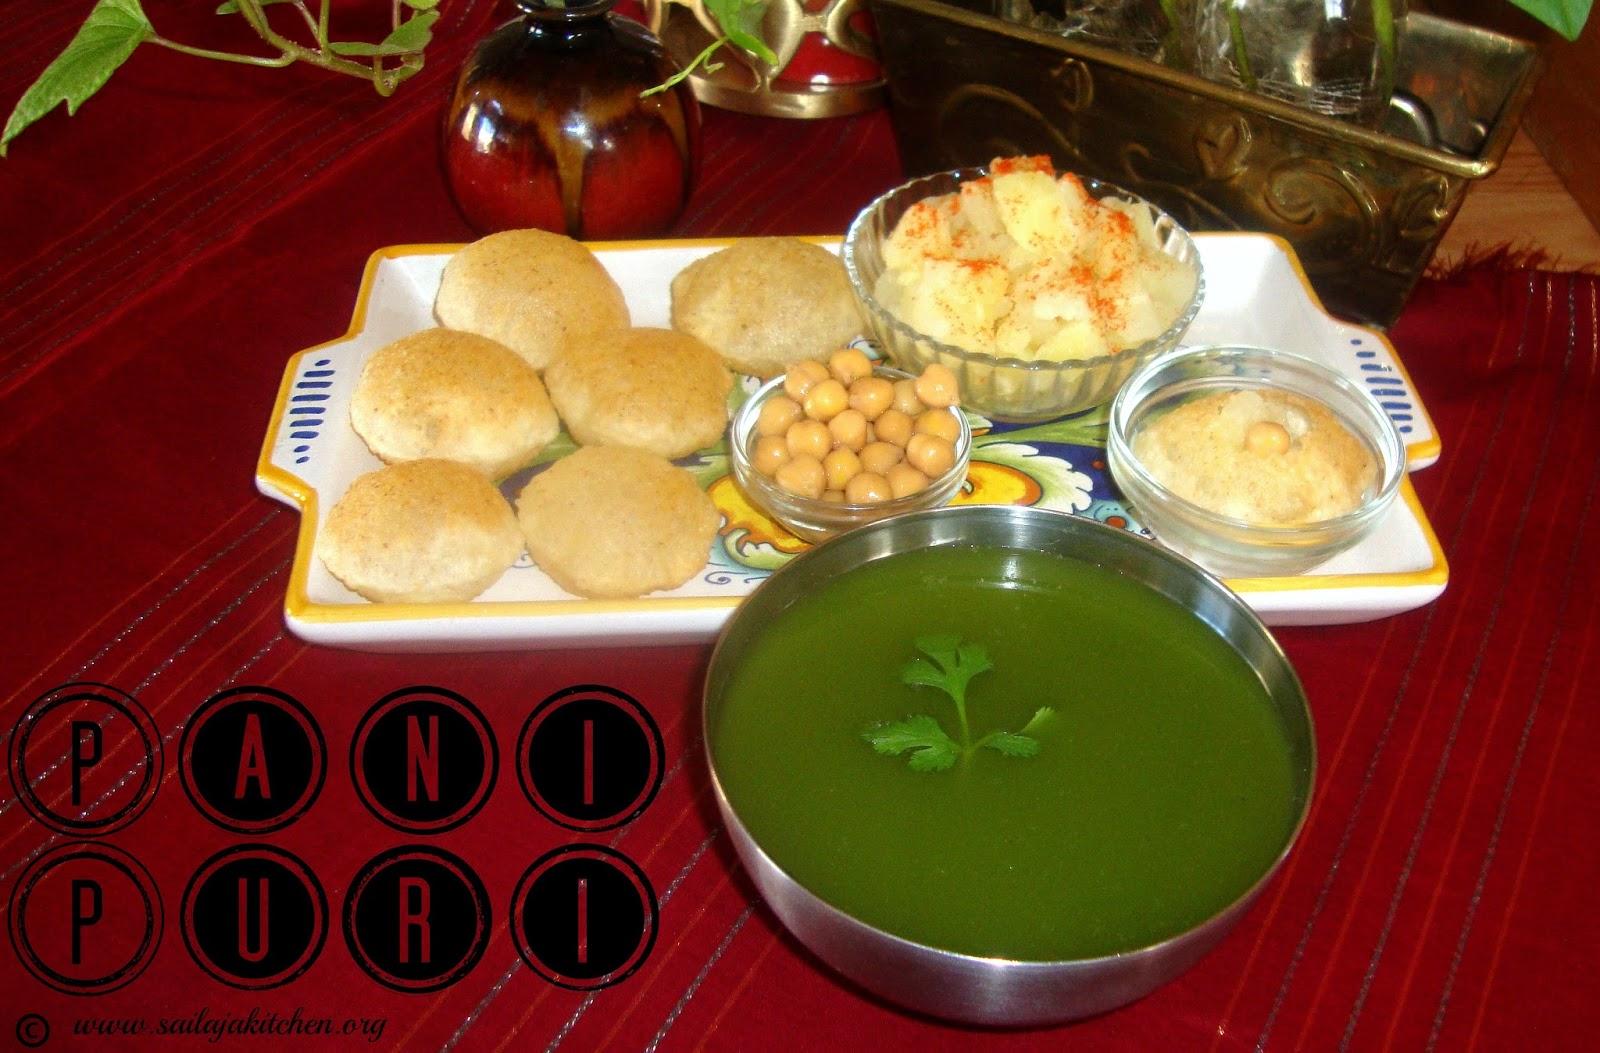 Sailaja kitchena site for all food lovers pani puri recipe pani puri recipe pani poori recipe how to make pani puri forumfinder Choice Image